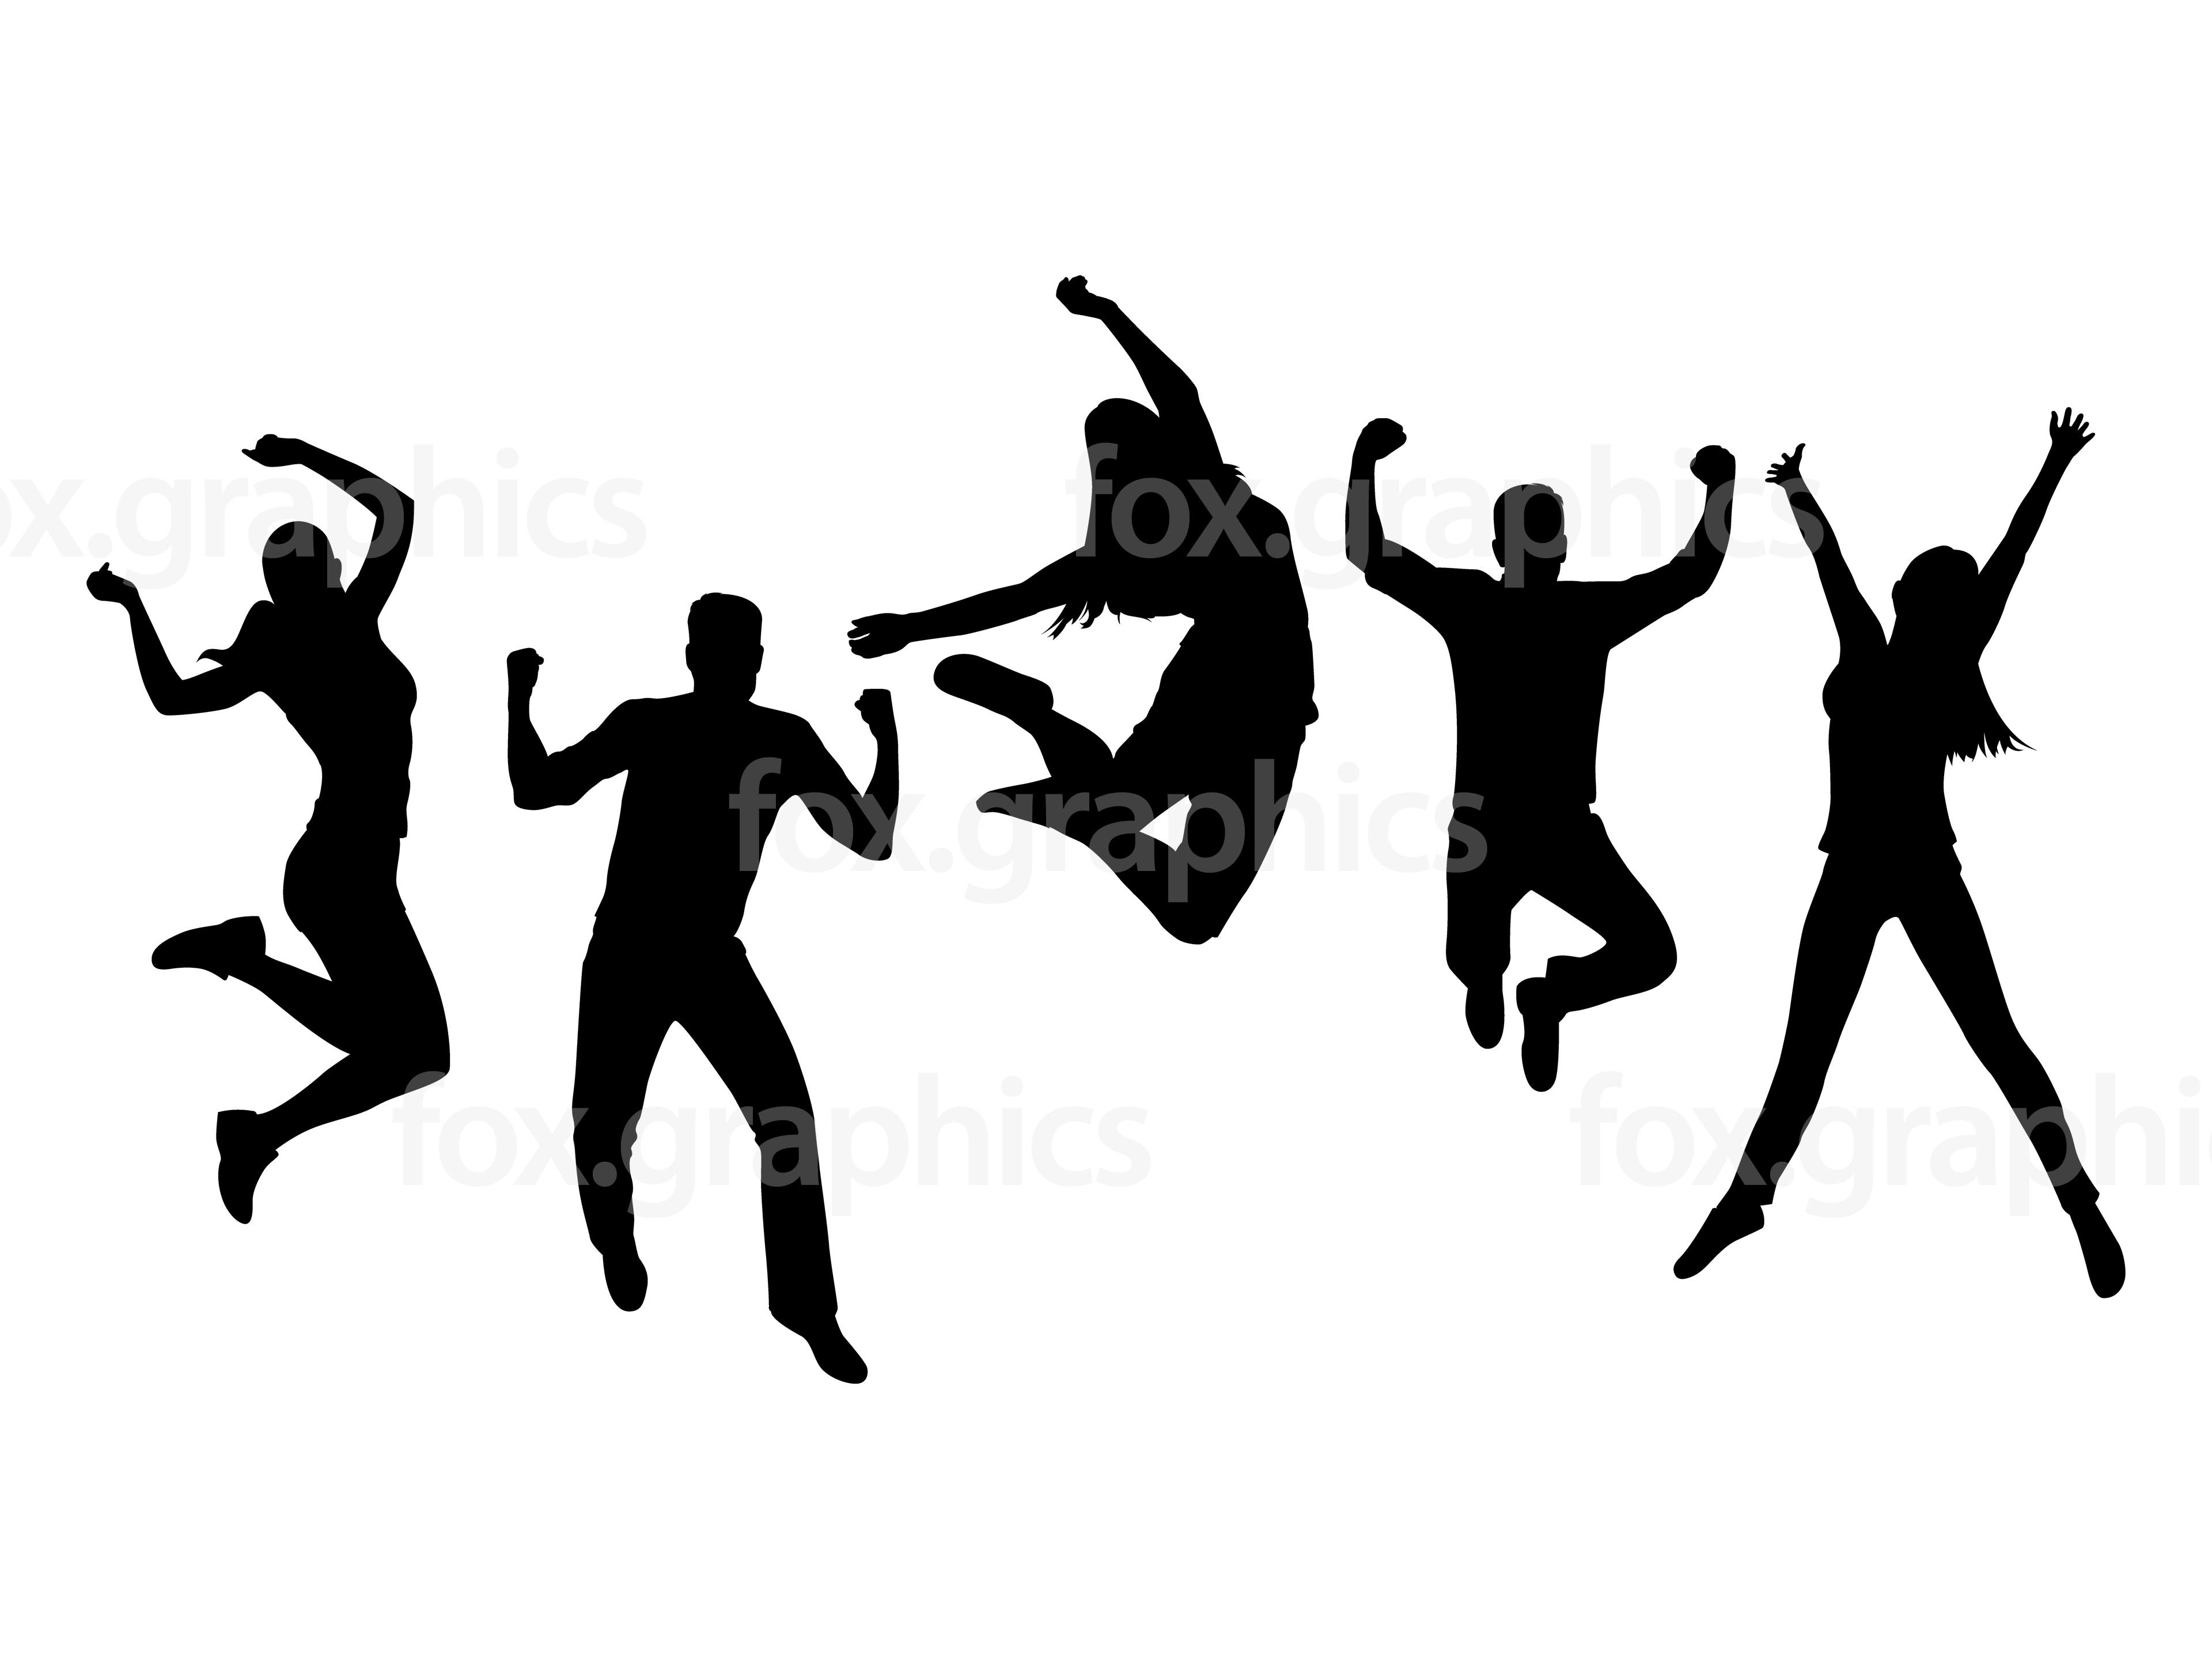 People Jumping Silhouette At Getdrawings